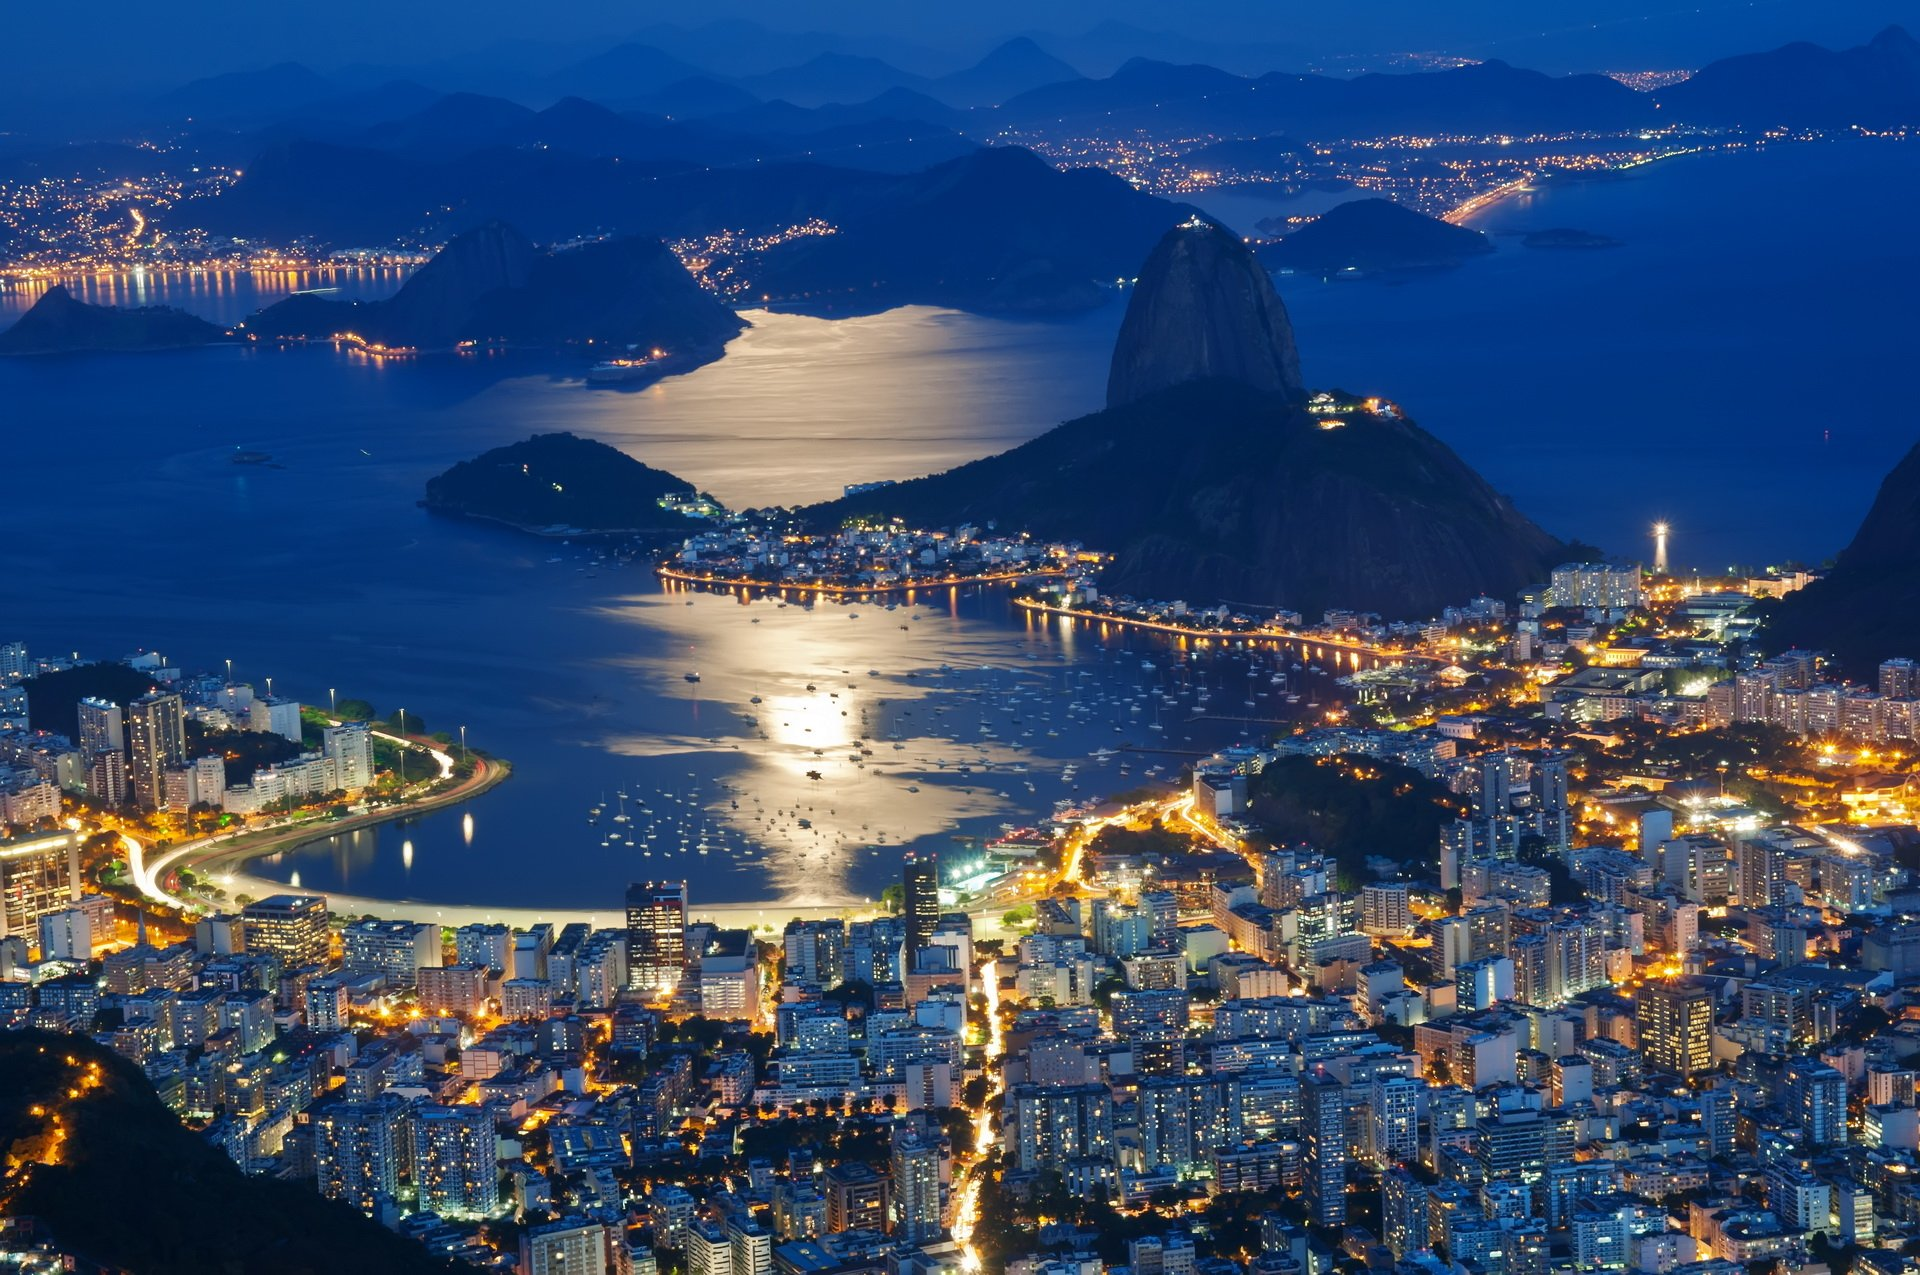 Rio De Janeiro Wallpaper Iphone Rio De Janeiro Full Hd Fond D 233 Cran And Arri 232 Re Plan